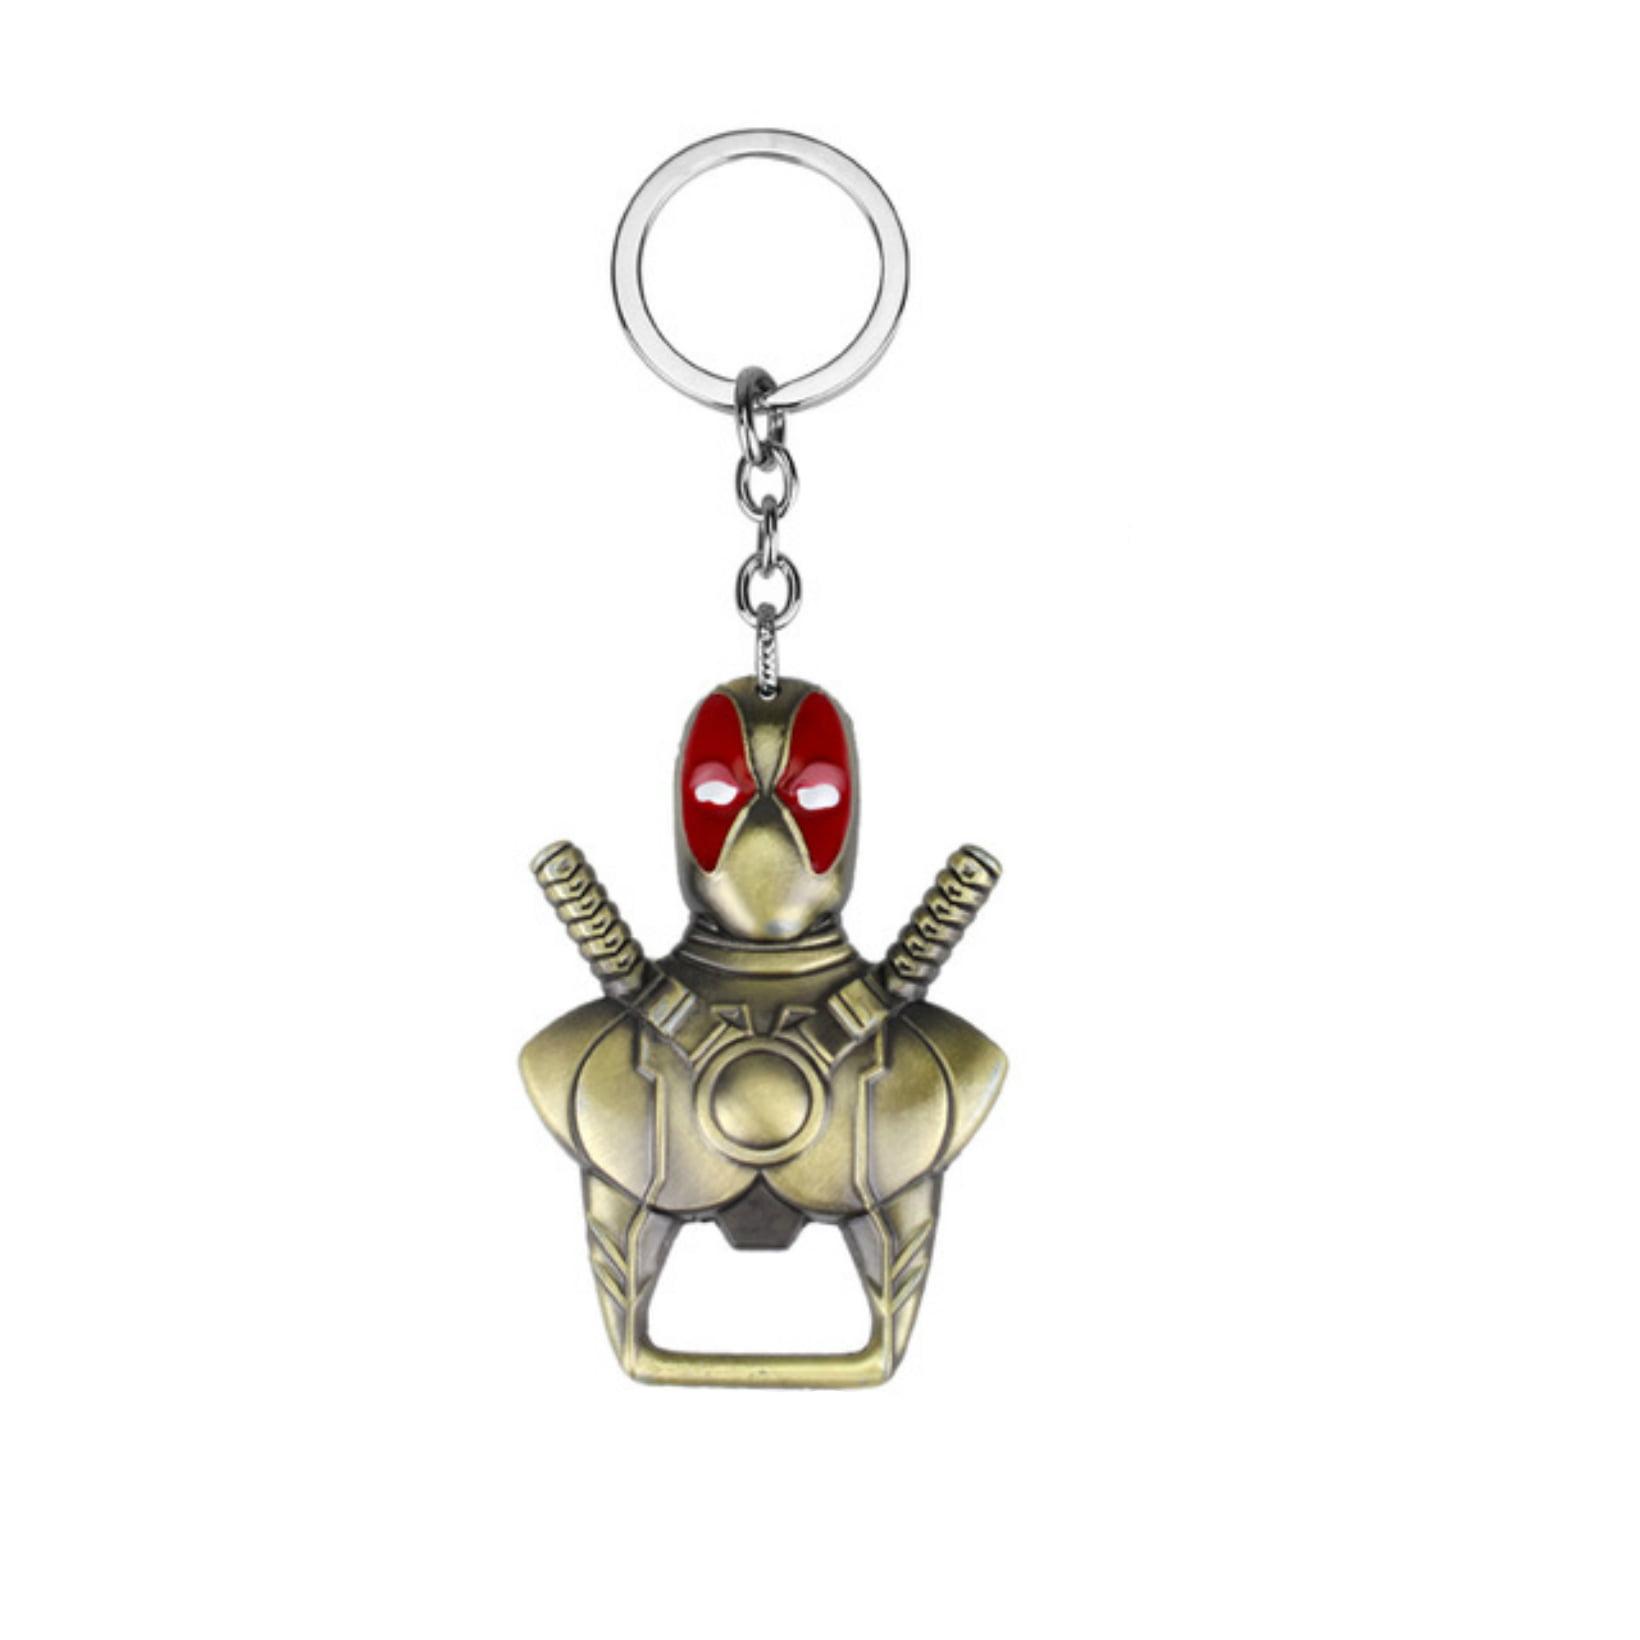 Captain America Mask Retro Vintage Movie//Comics Charm Pendant Key Chain Keys